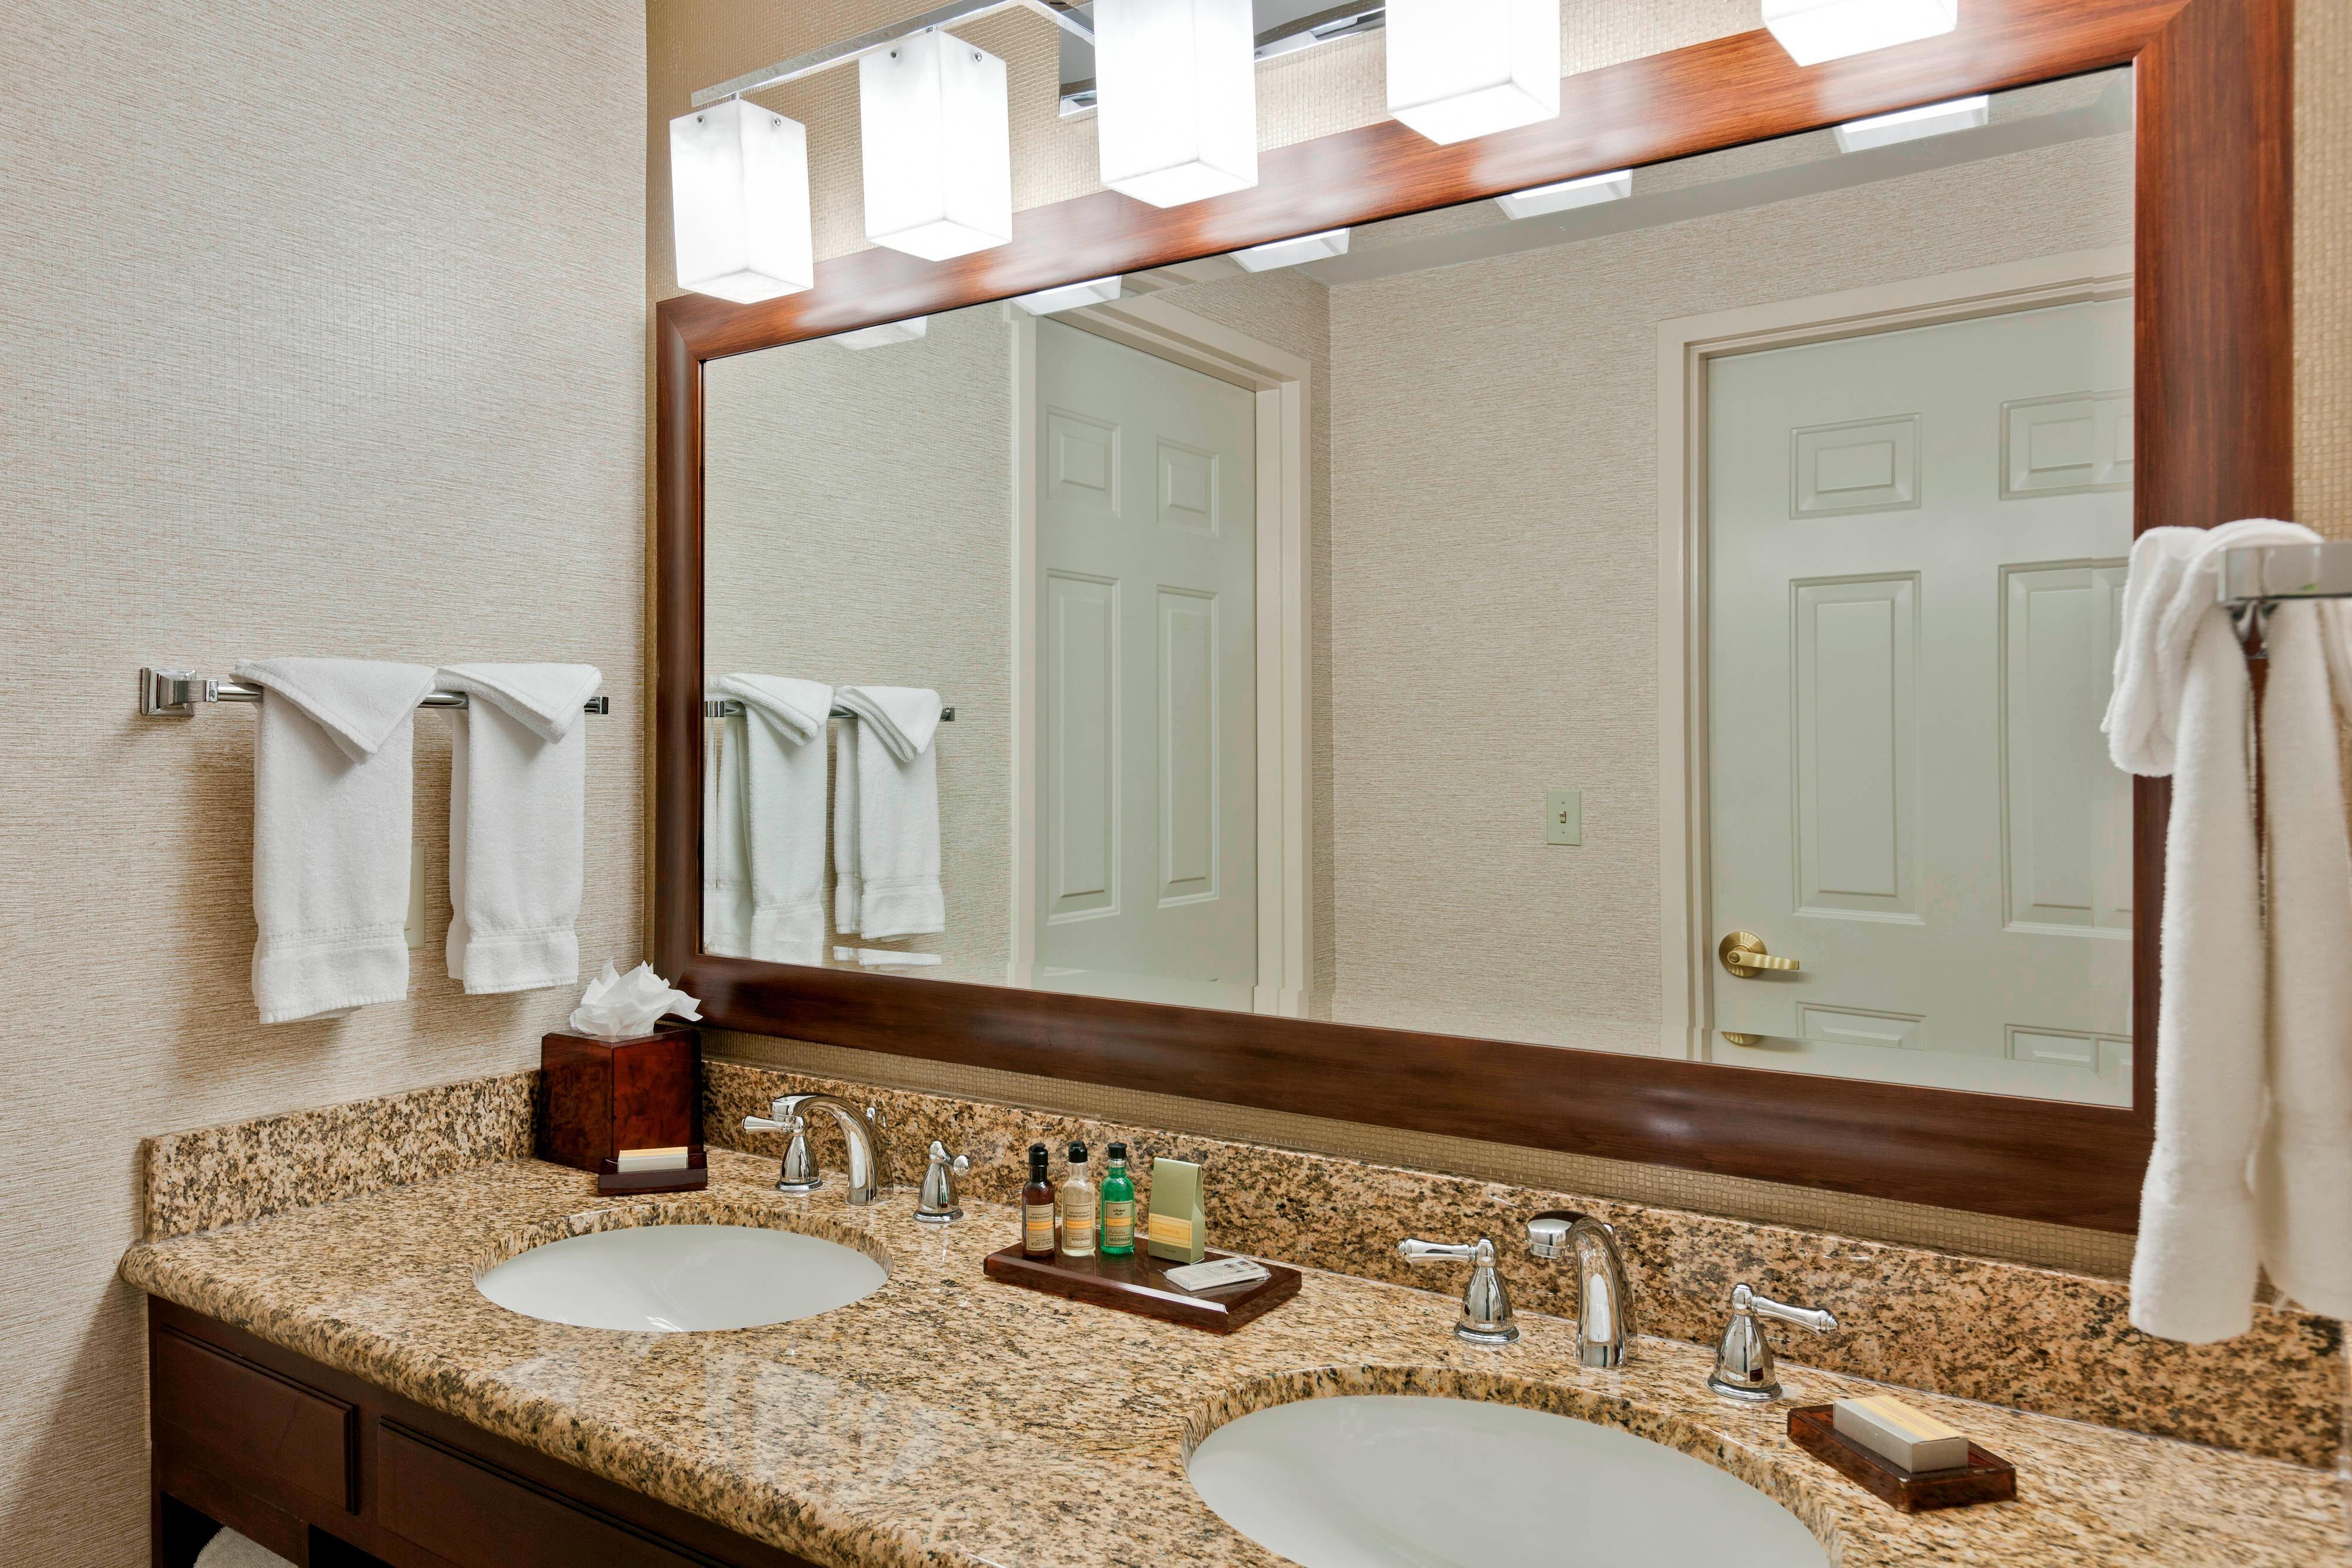 Chicago Marriott Midway Bathroom